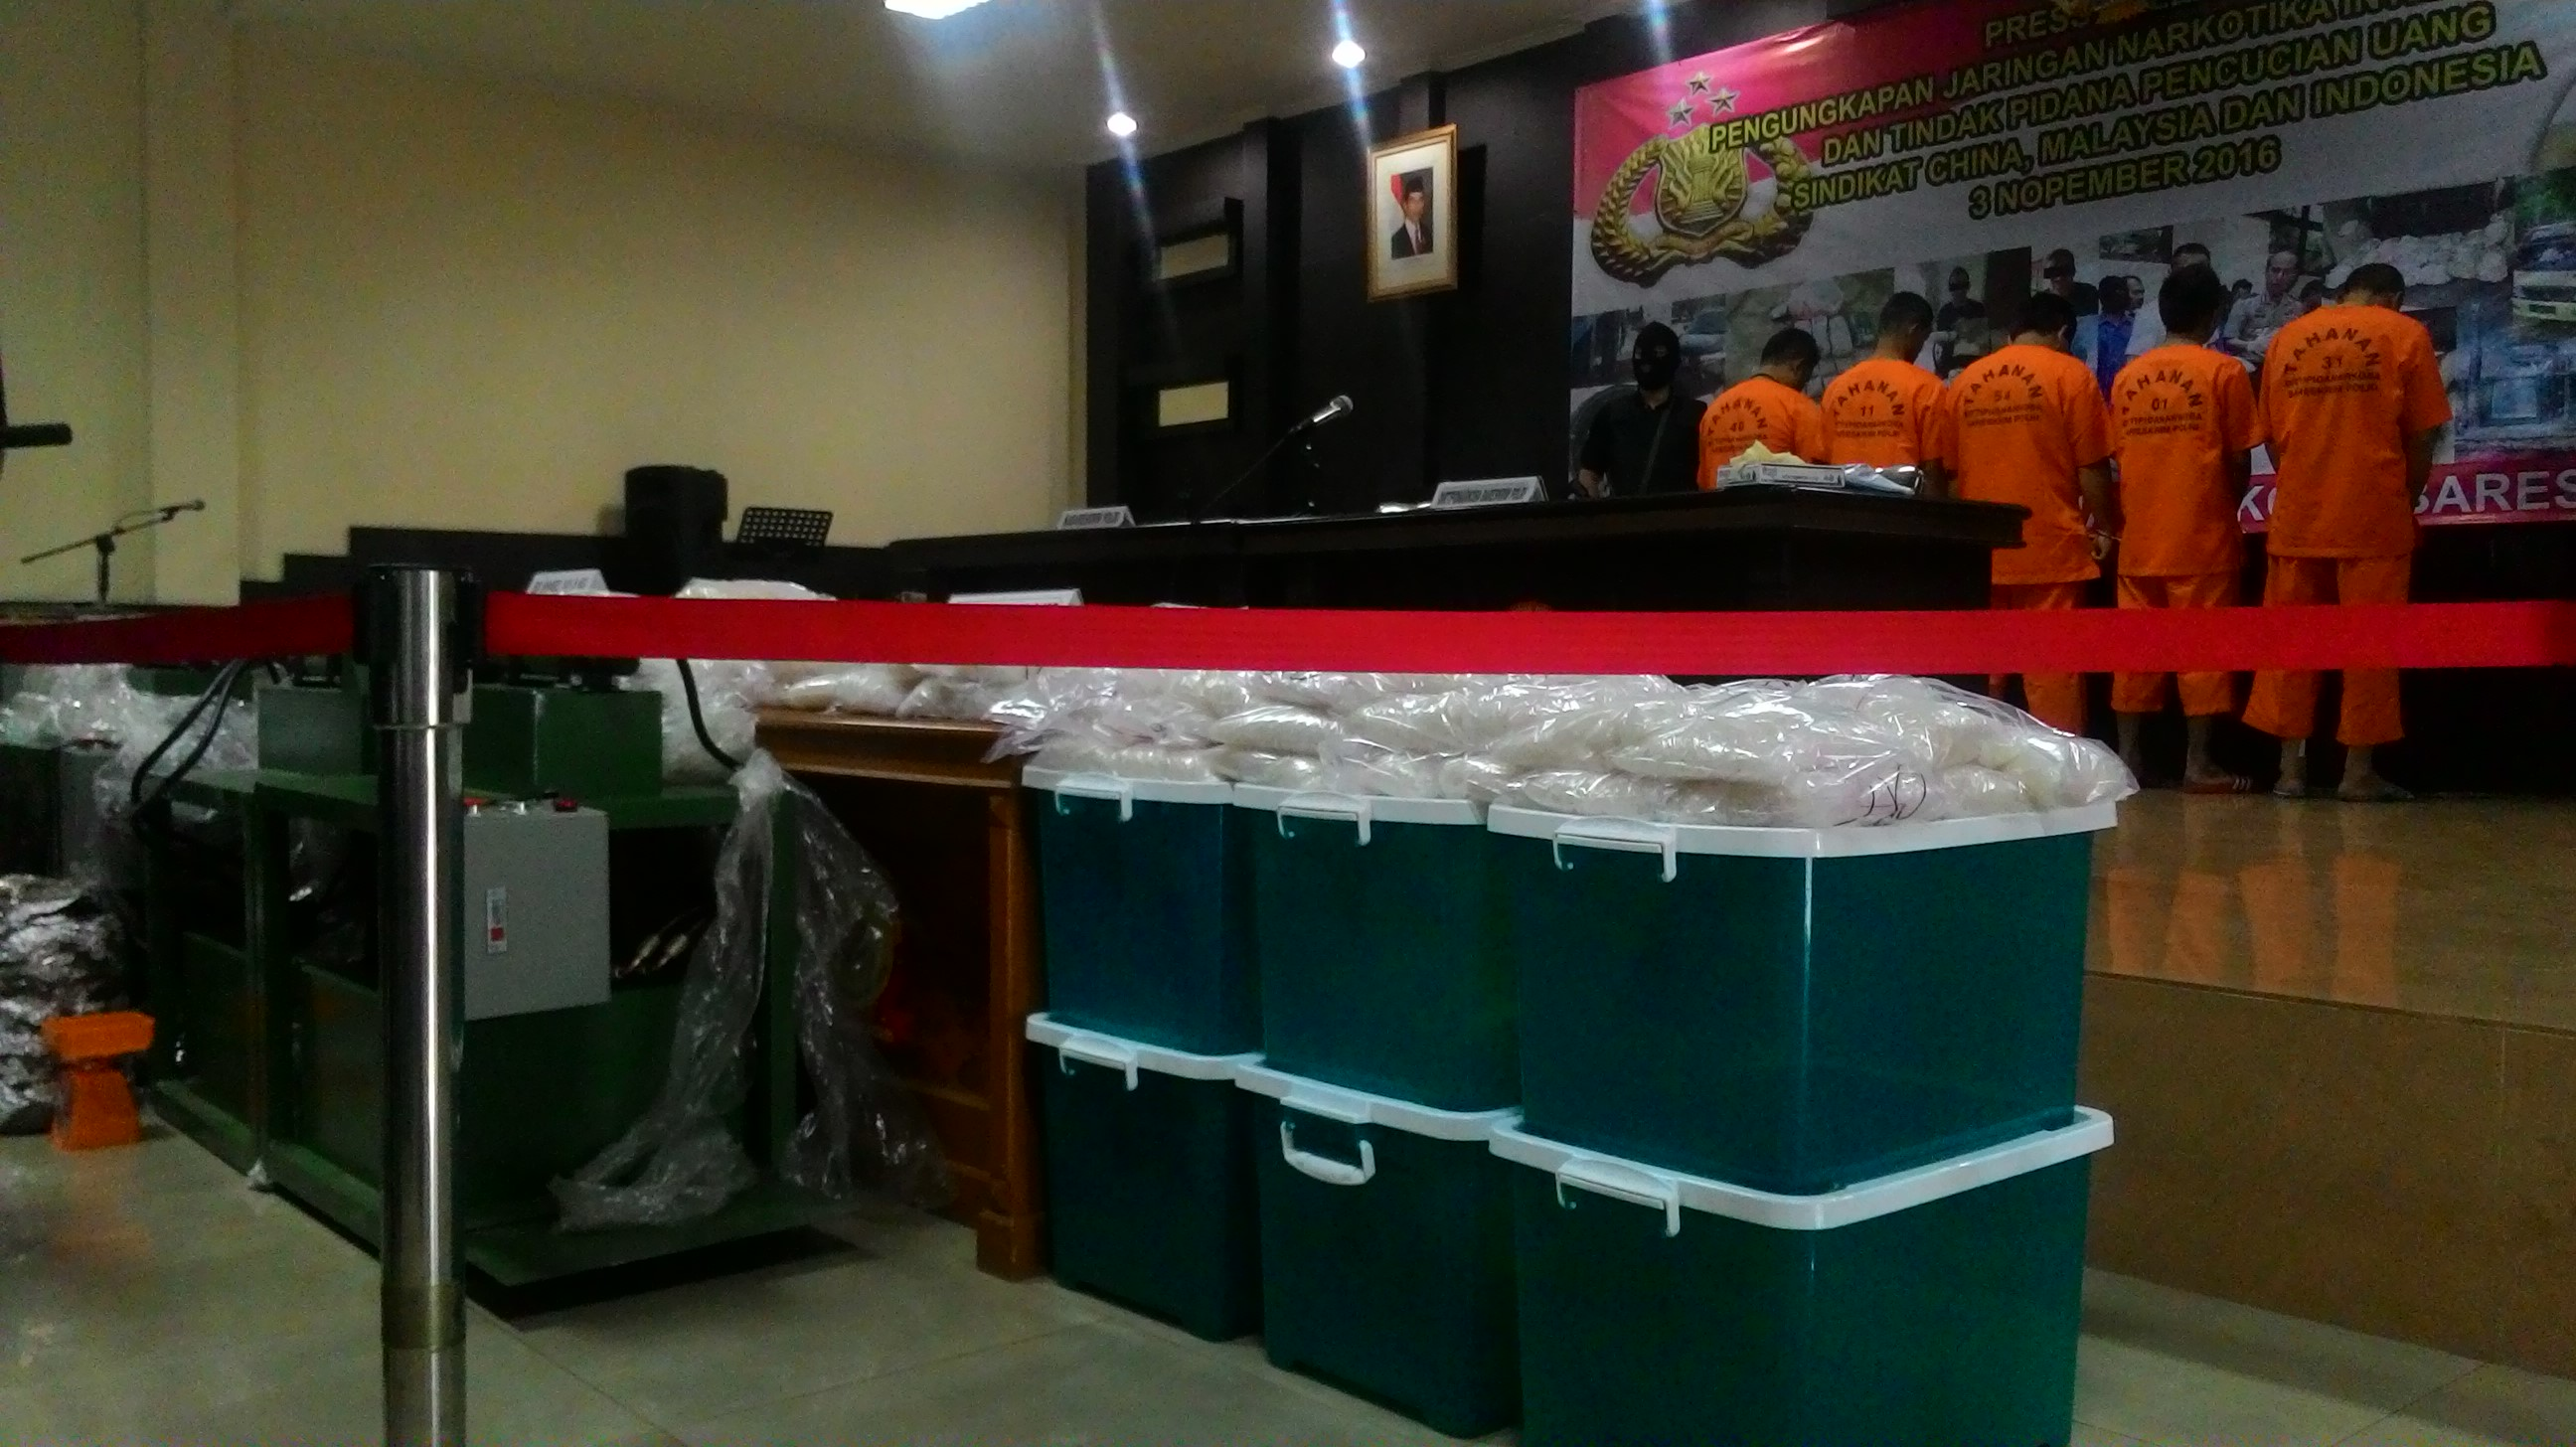 Dua sindikat Narkoba Internasional yang ditangkap Bareskrim Polri. Foto : Istimewa